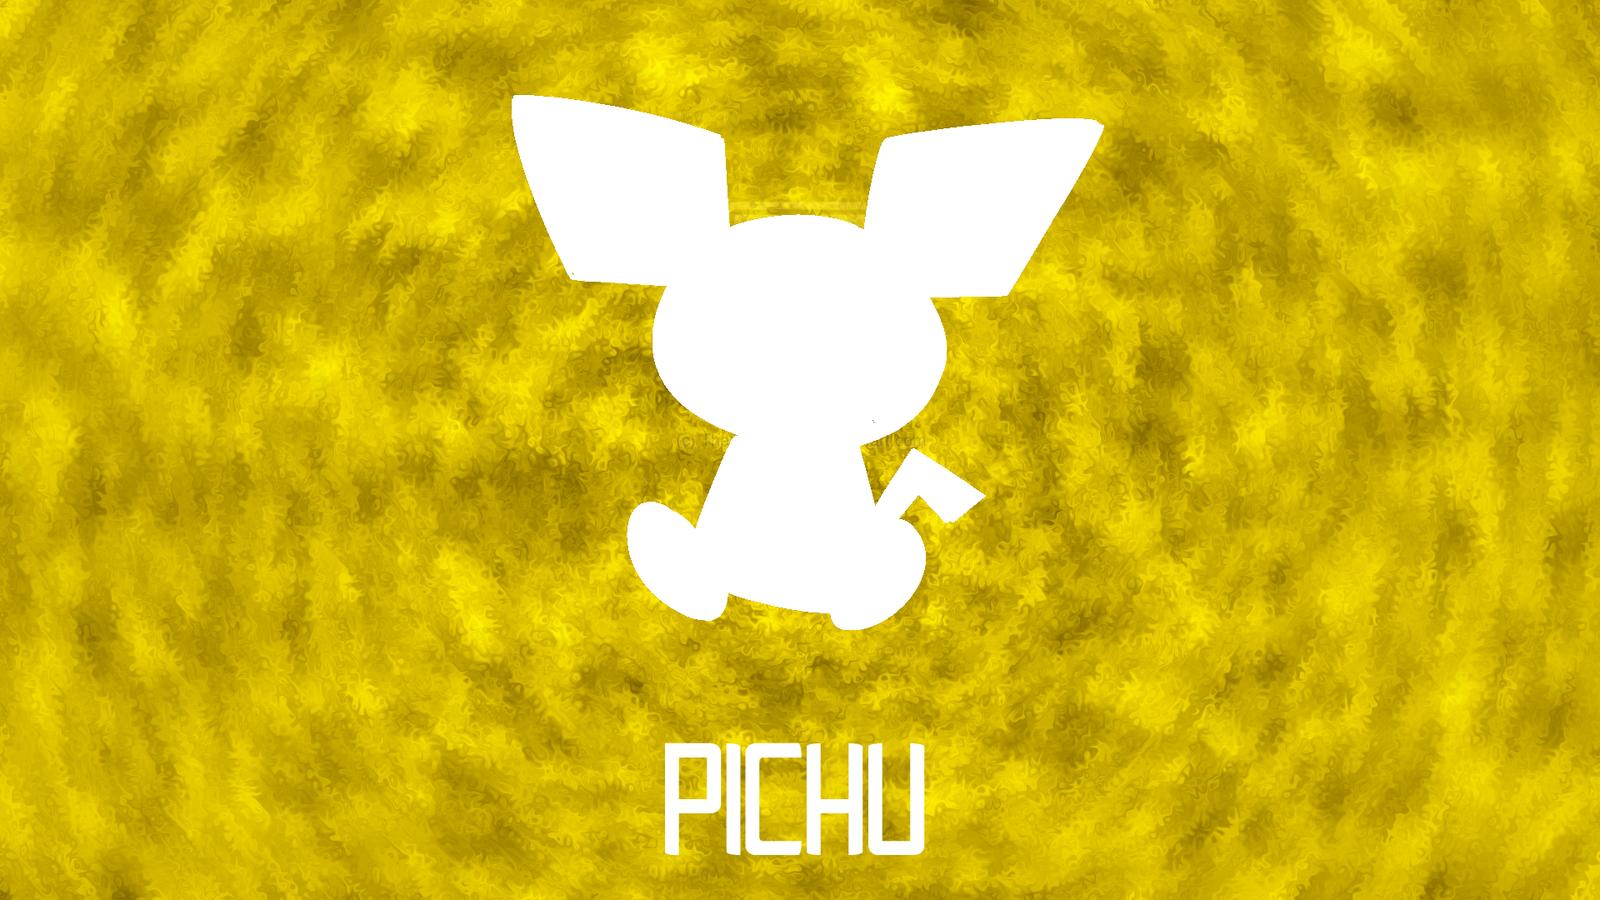 Pichu Wallpaper for Pinterest 1600x900